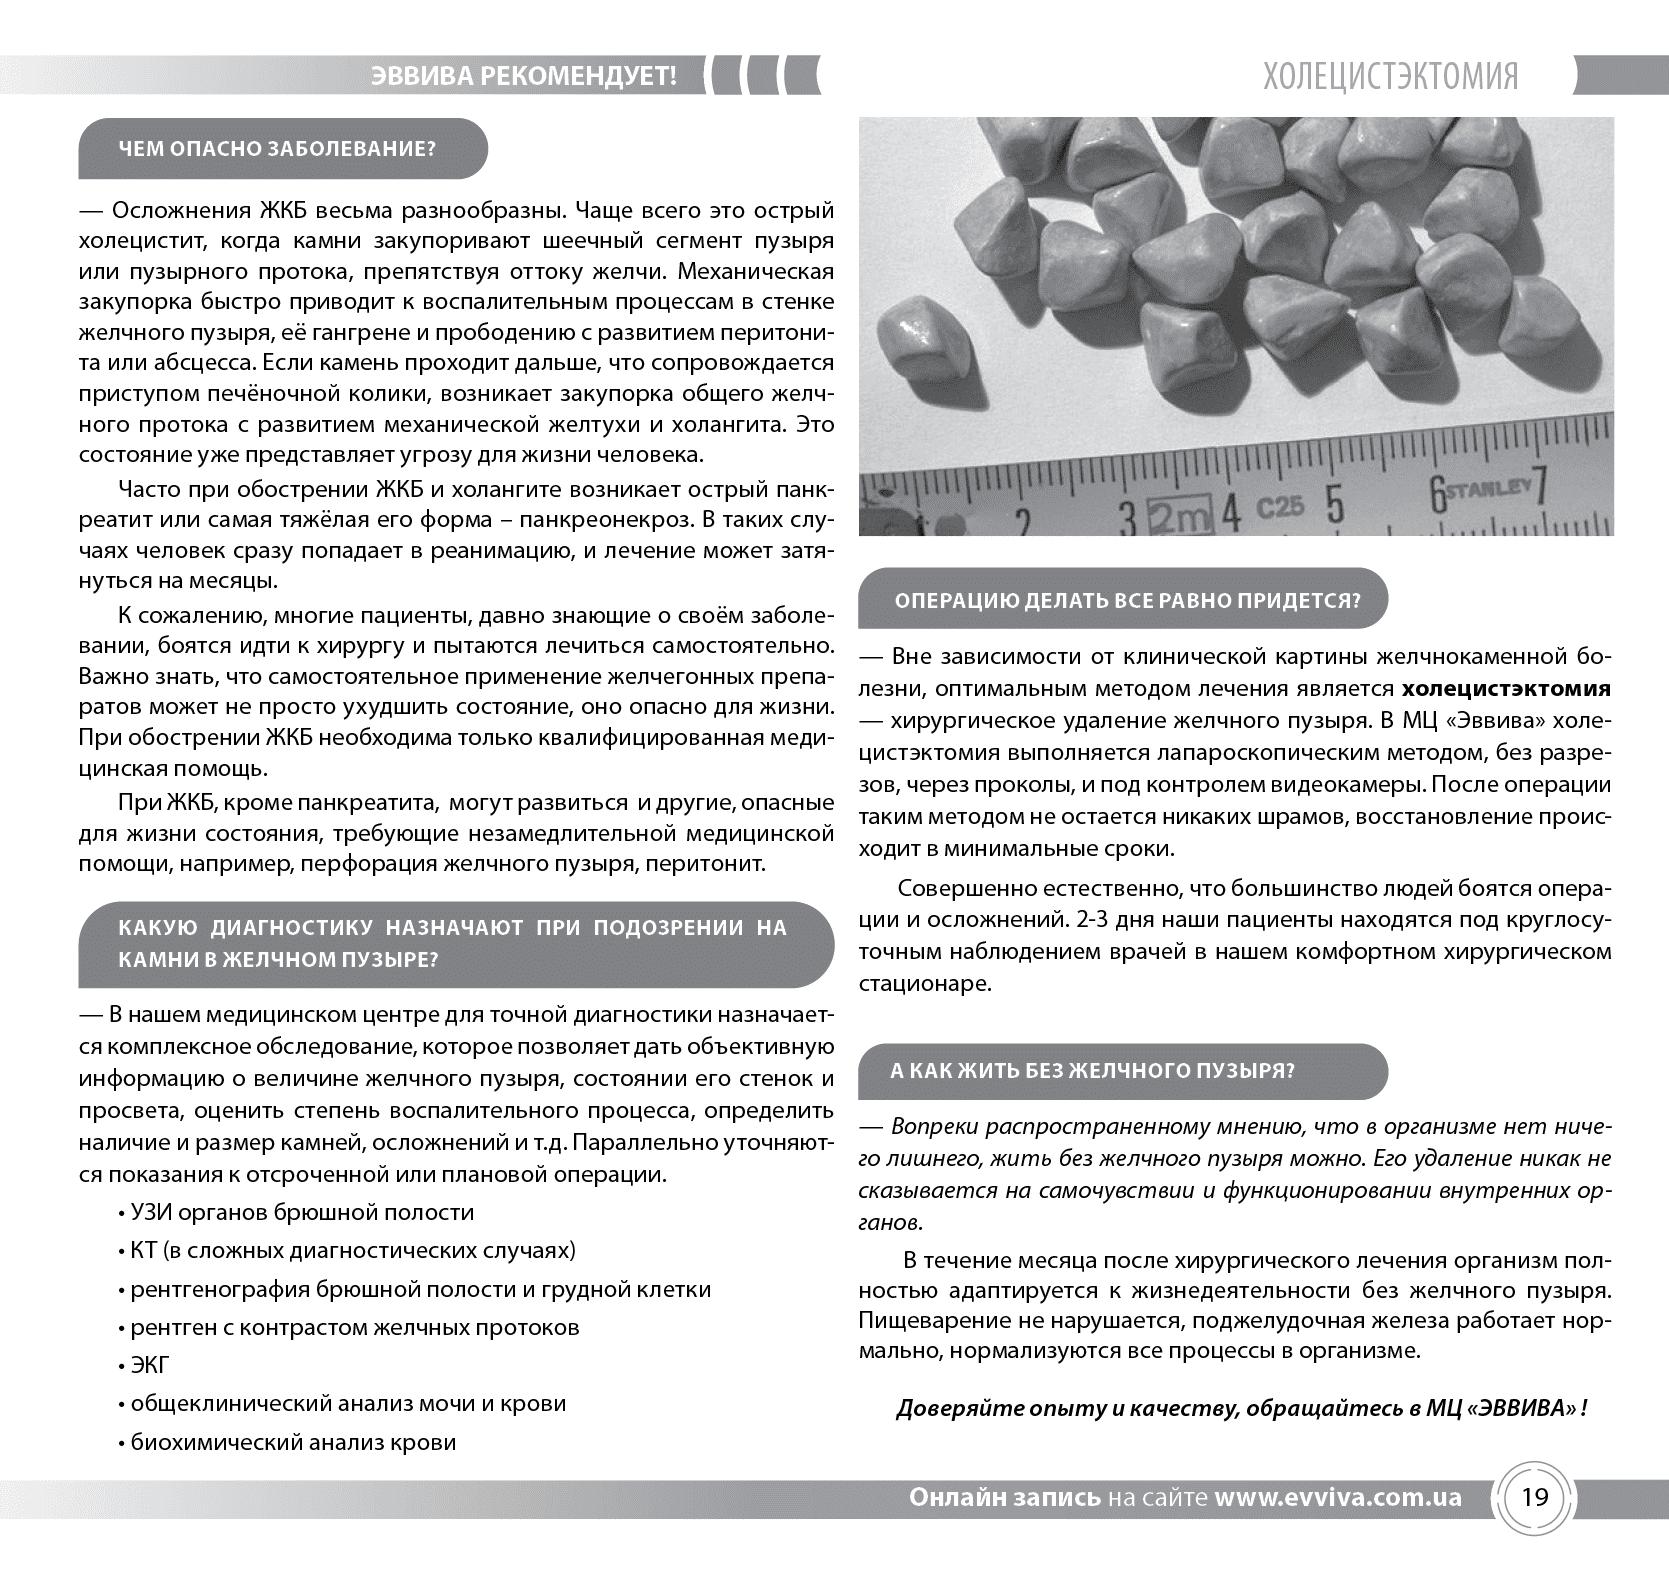 evviva-zhurnal-118-page19